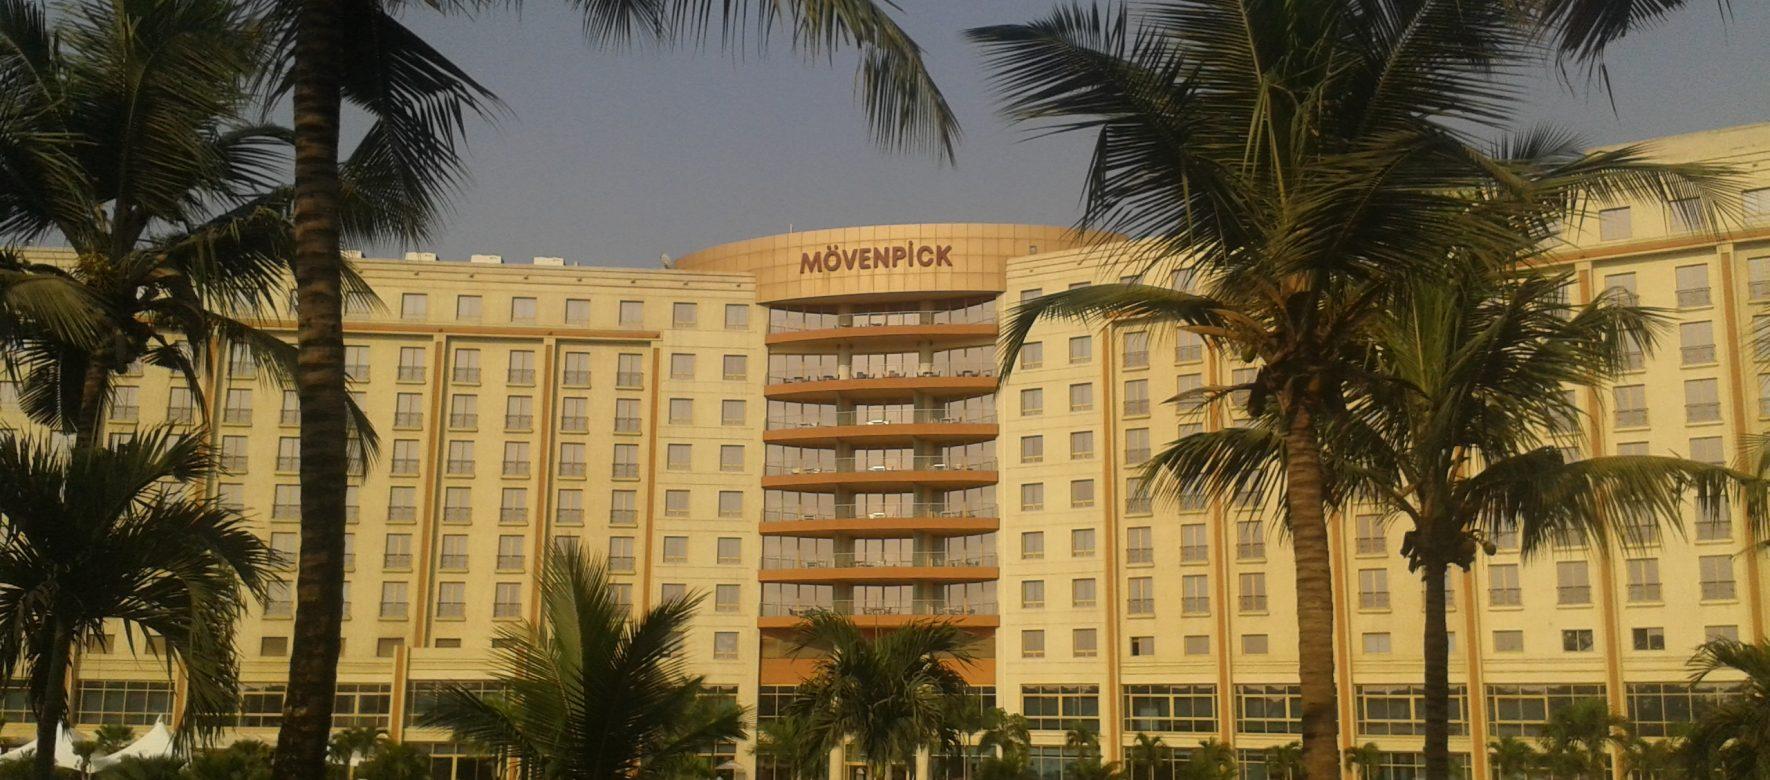 Egypte : Mövenpick Hotels & Resorts ouvre un nouvel hôtel!